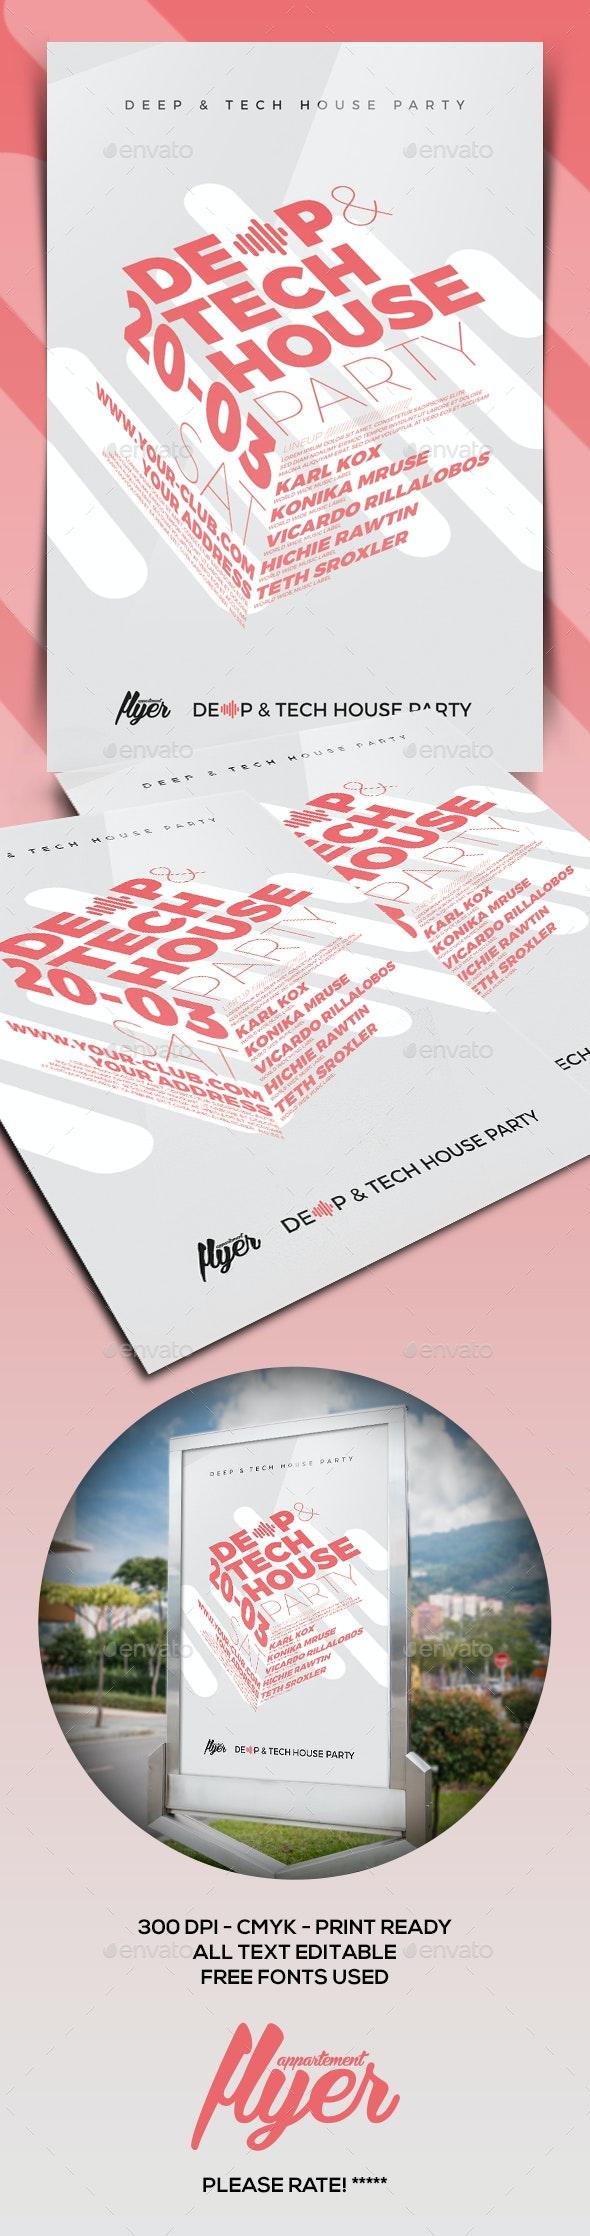 Deep & Tech House Flyer - Clubs & Parties Events